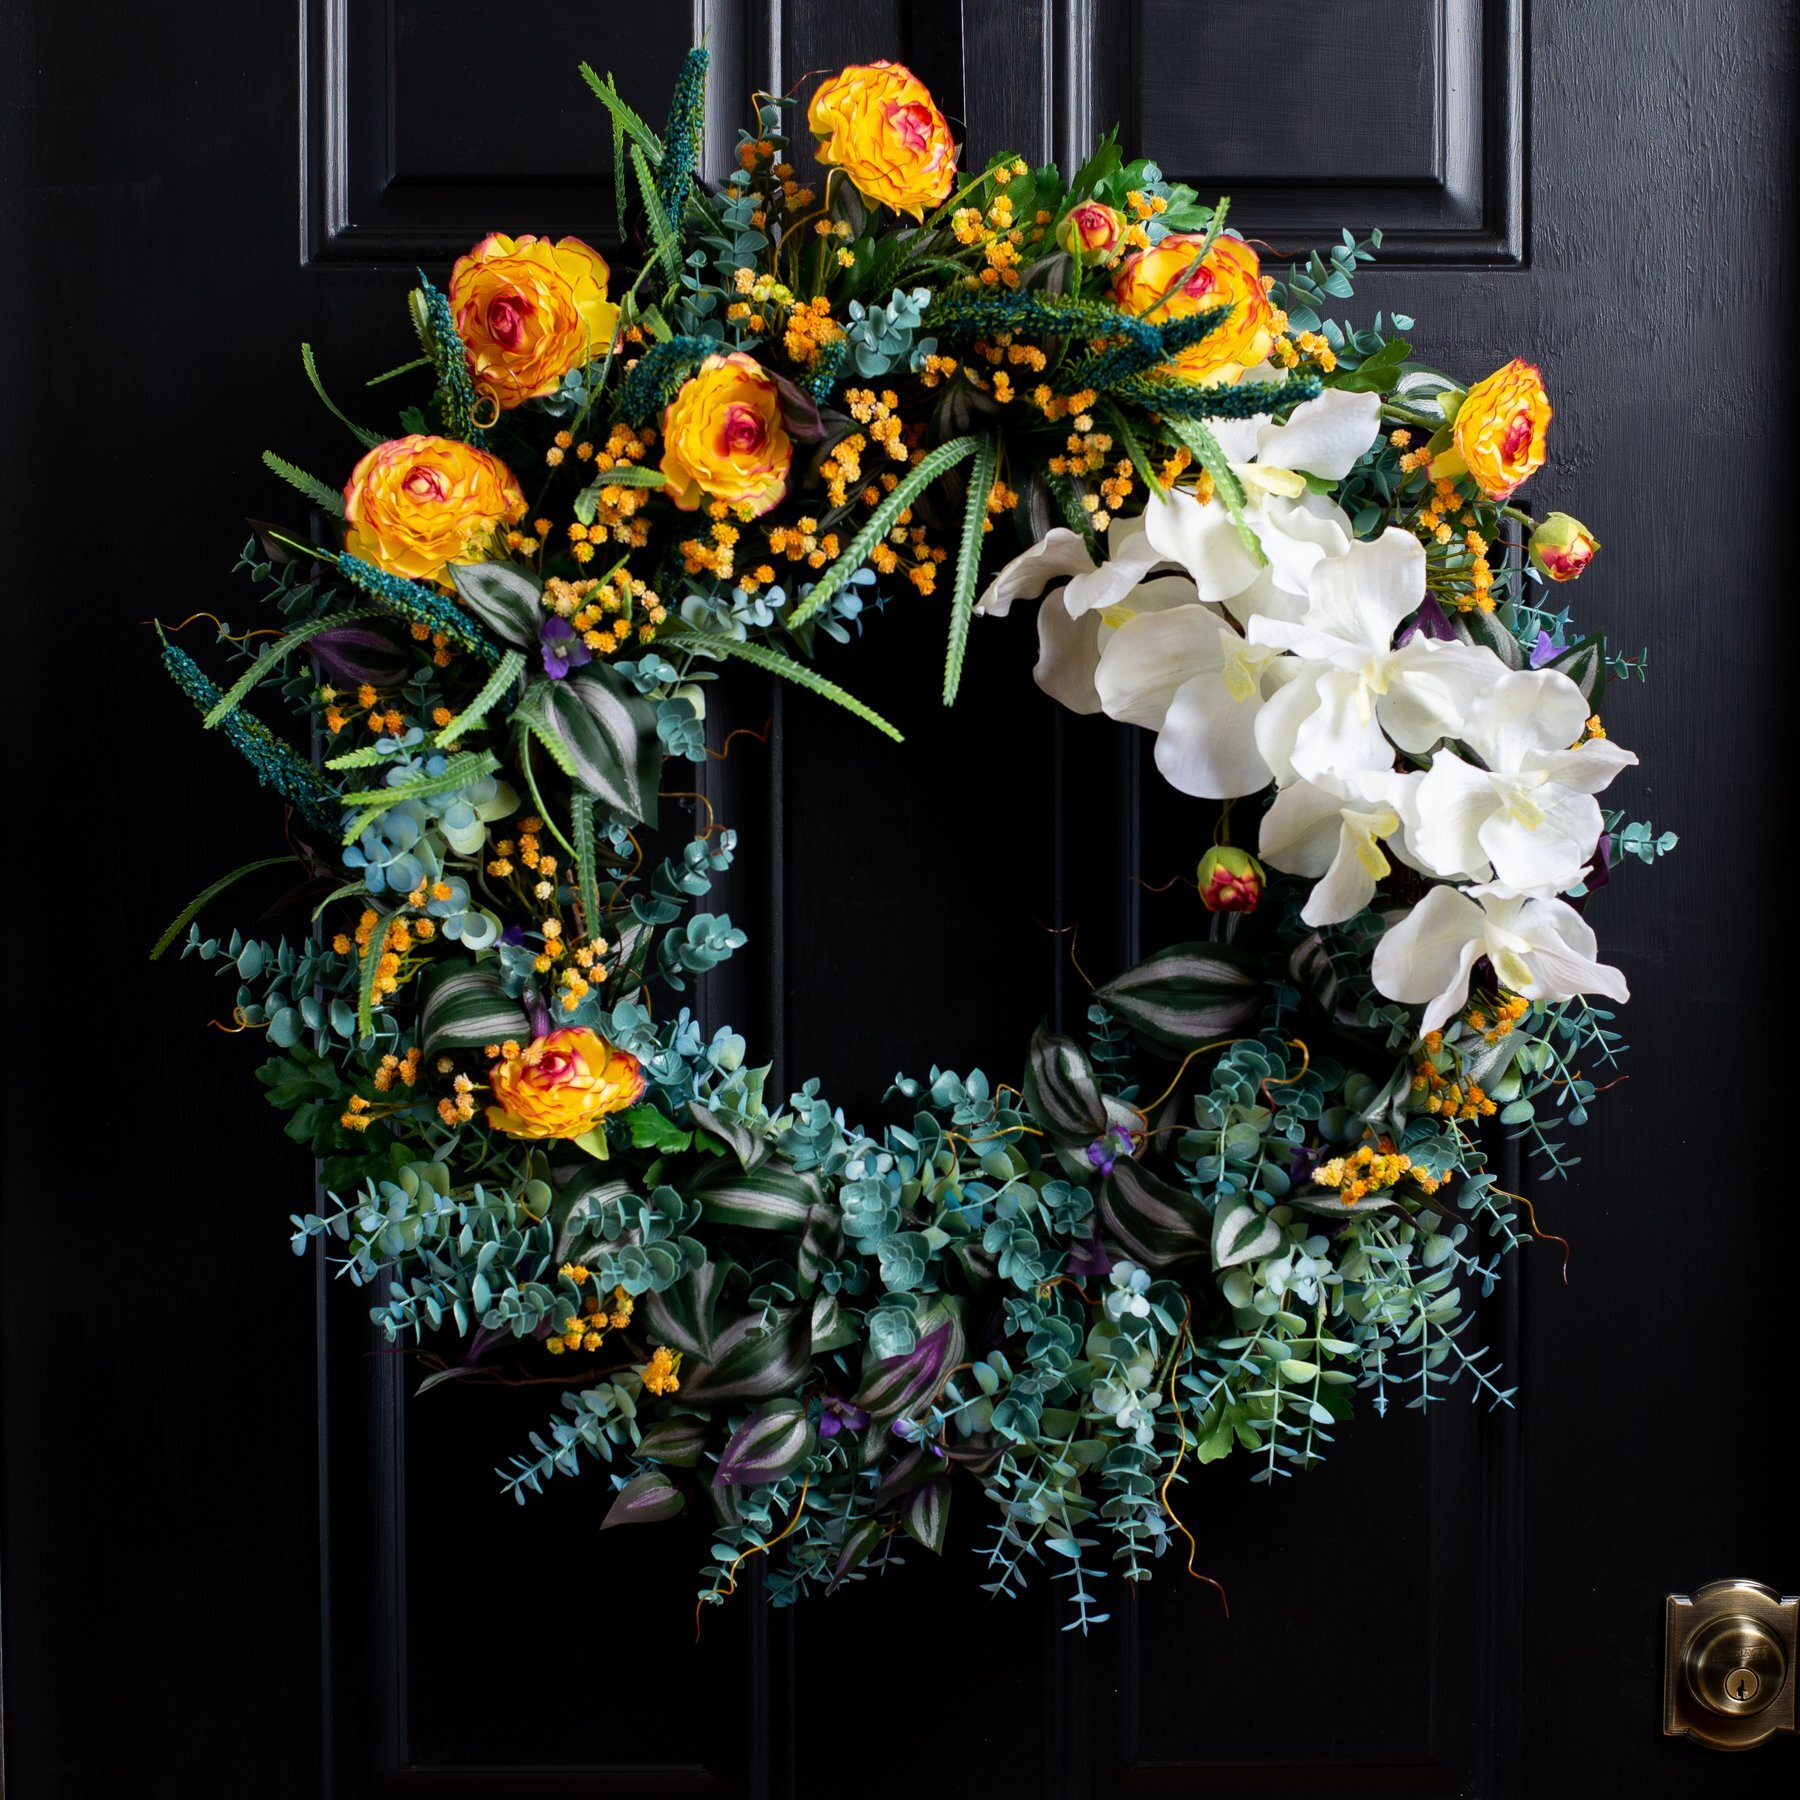 Spring Wreath door hanger Fern wreath Wreath Front Door Wreath Summer Wreath Orchid Wreath Peony Flower Wreath Greenery Wreath